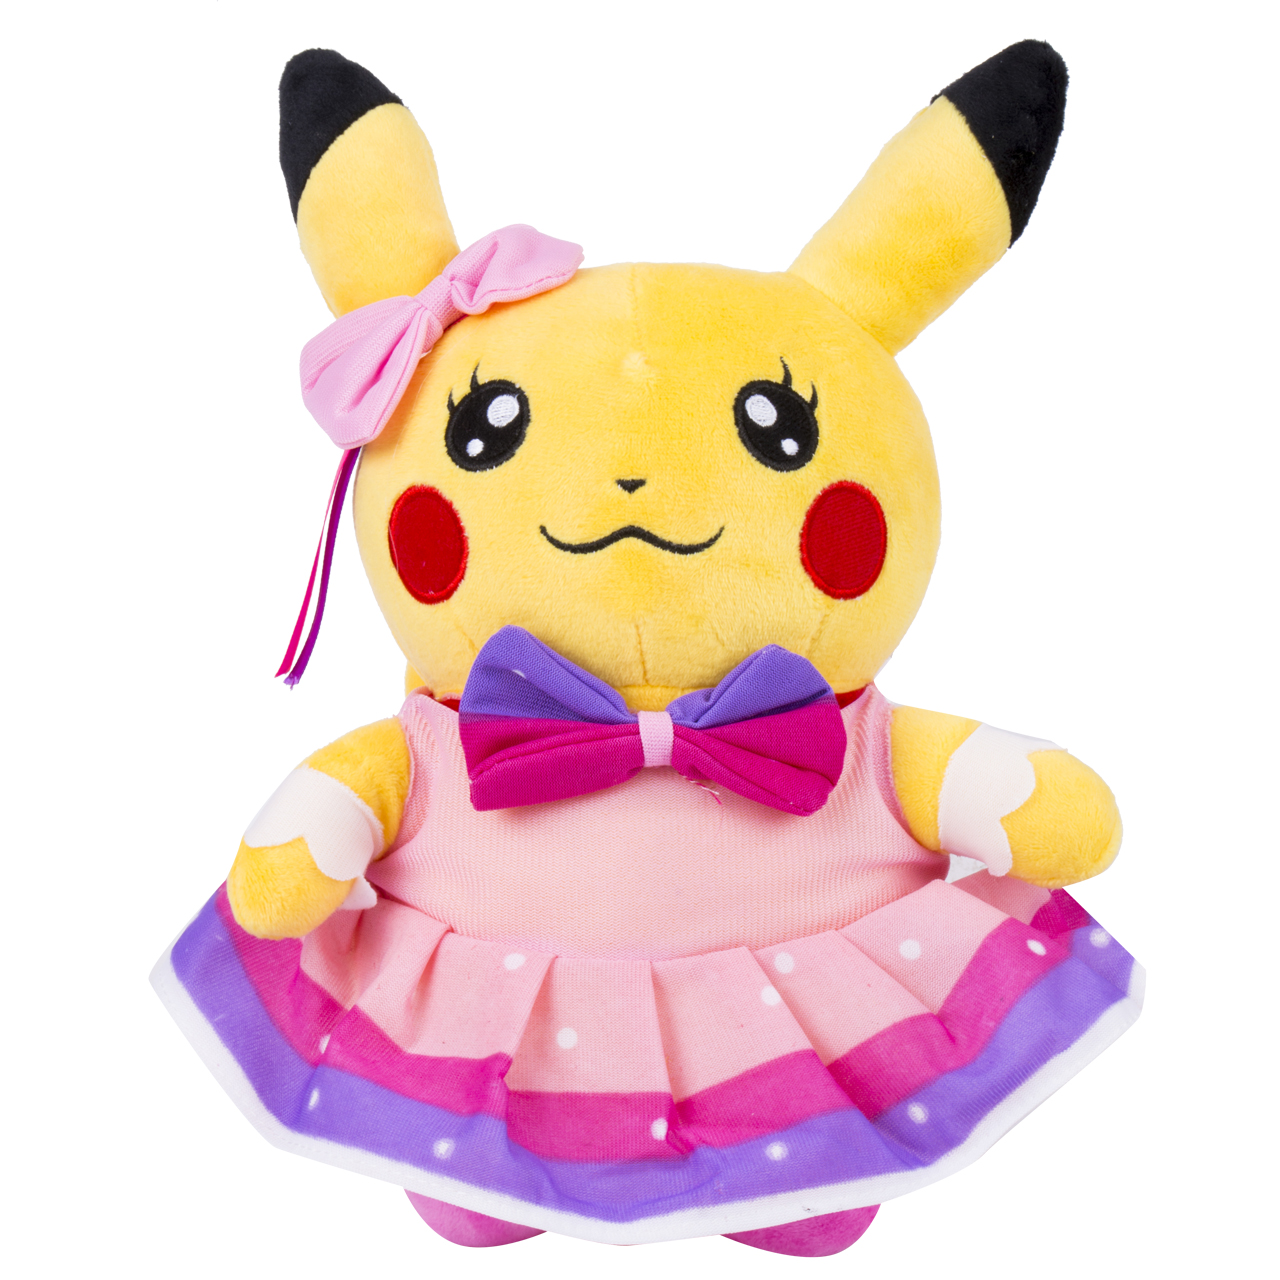 Fashion Pokemon Go Team Pikachu Soft Stuffed Plush Doll Kids Children Baby Toy Gift